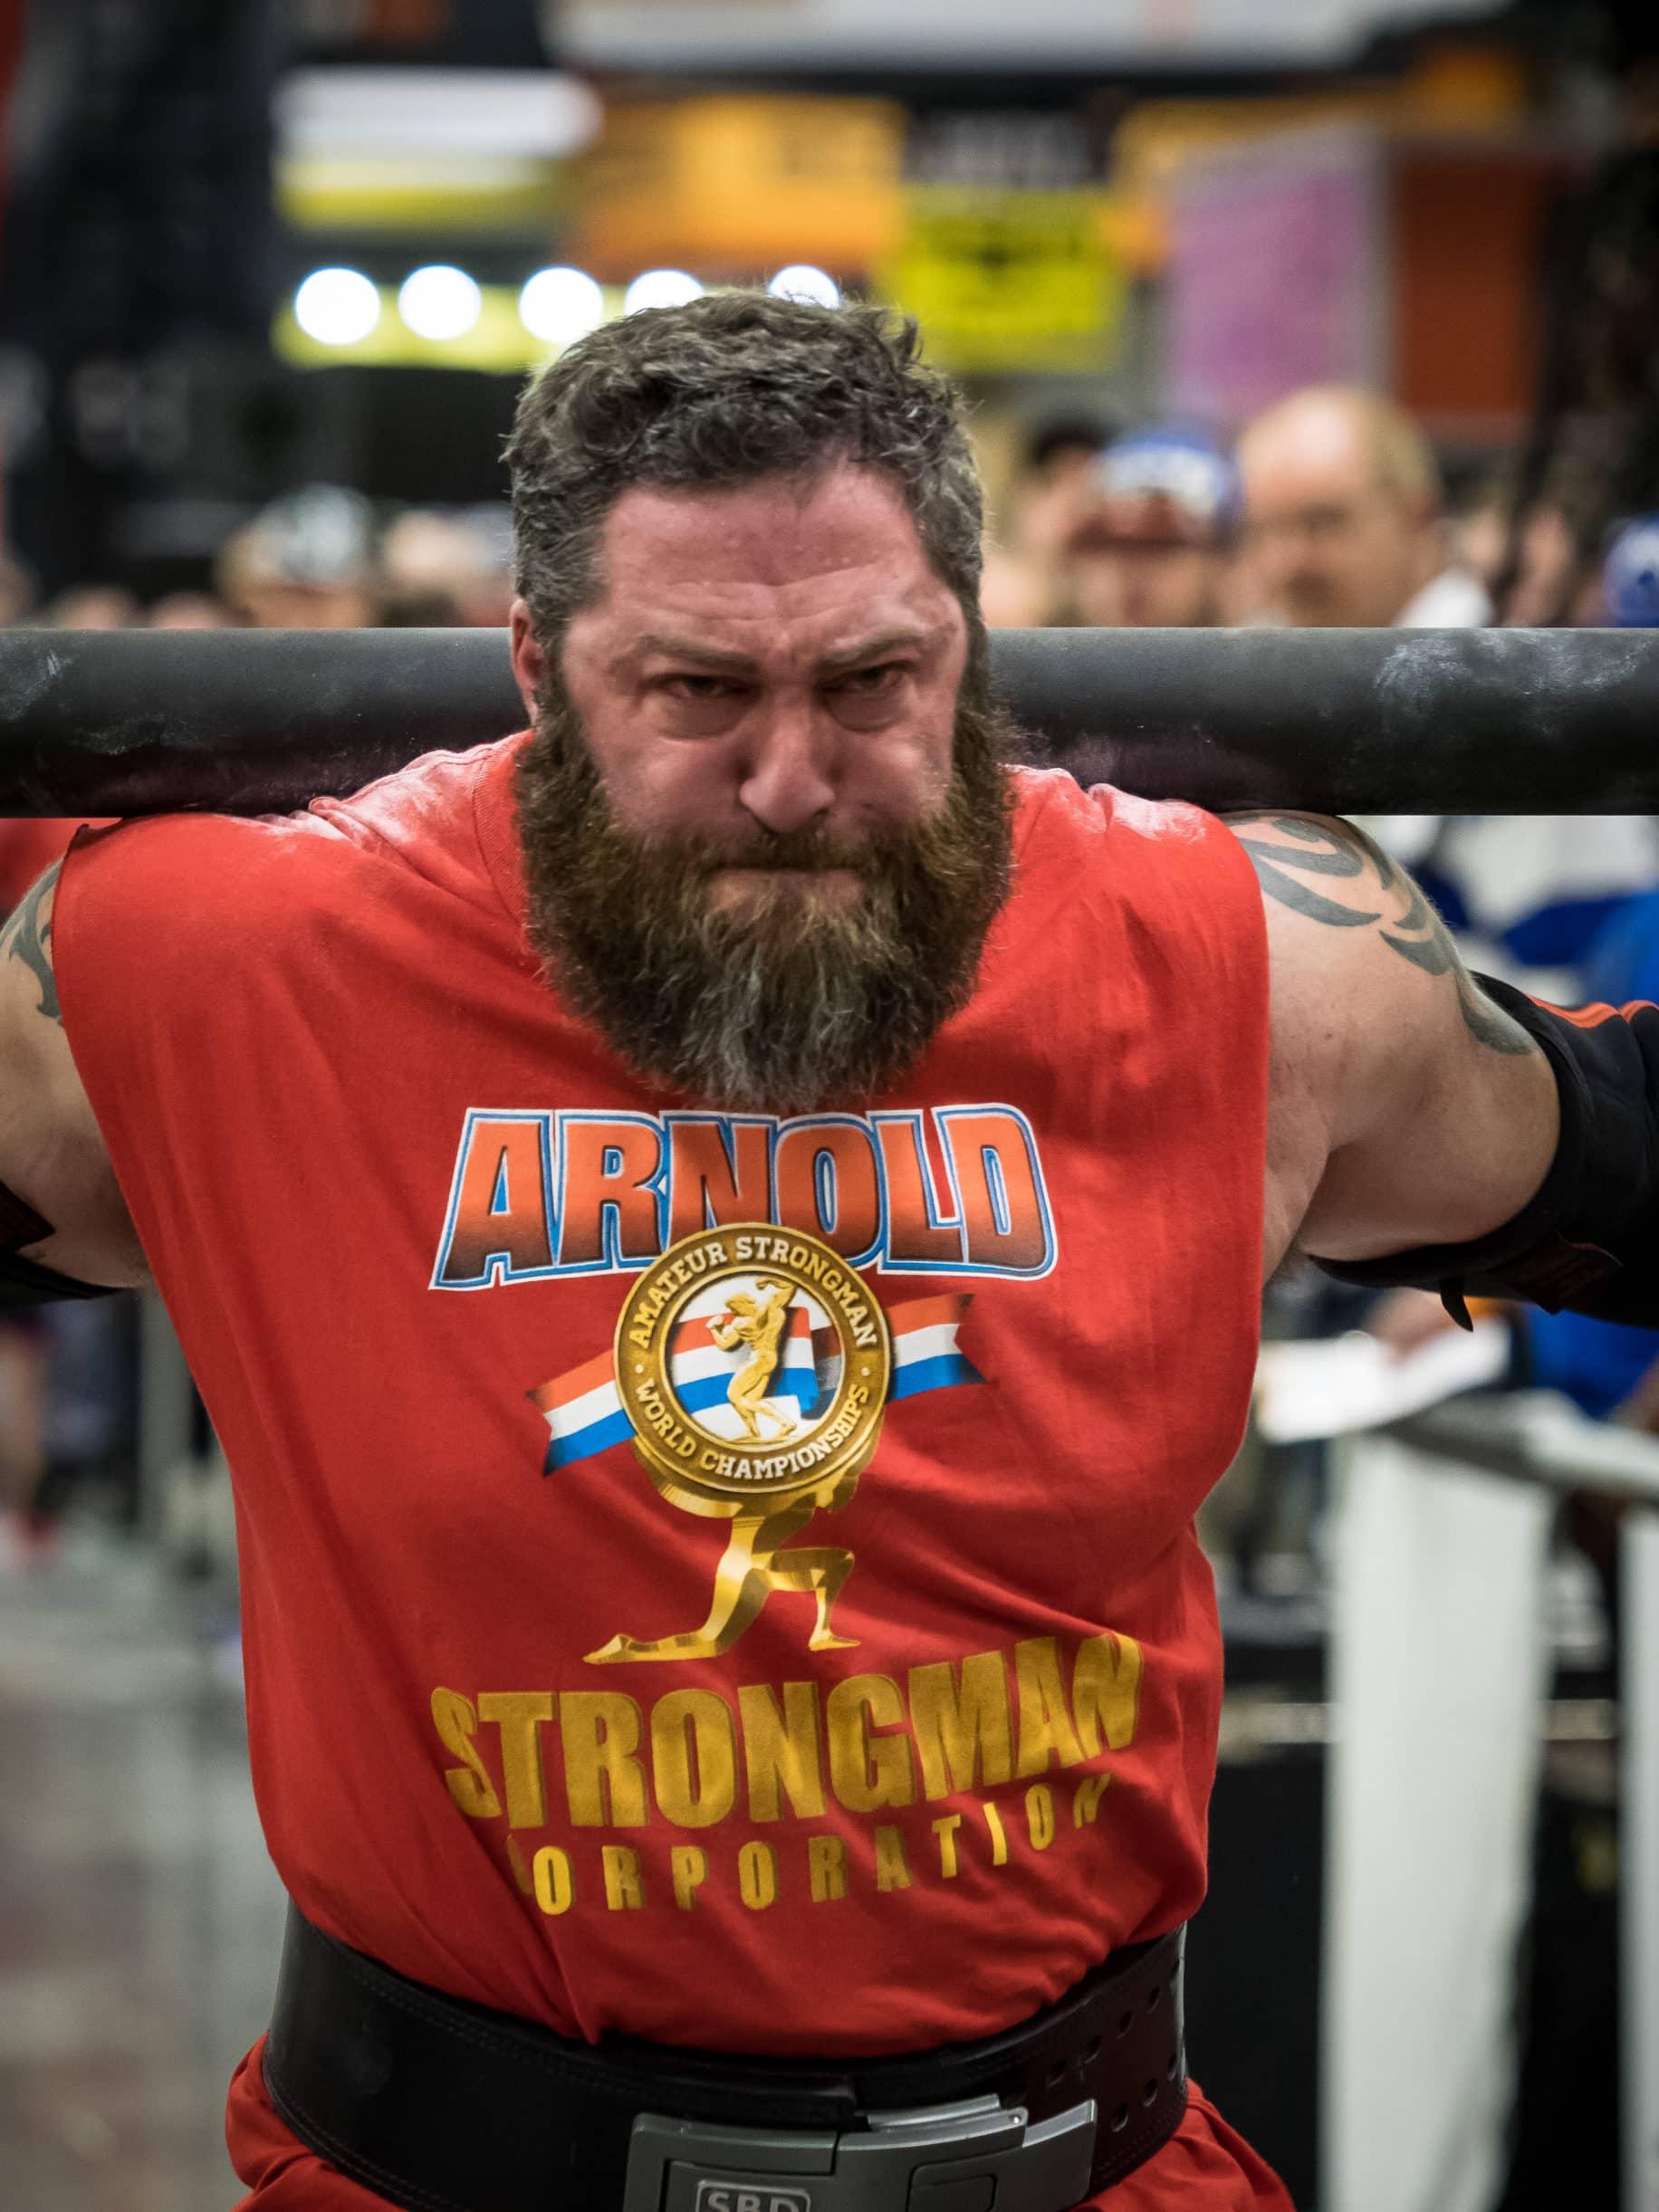 How Can Desk Jockeys Compete Against Career Strongmen? - BarBend